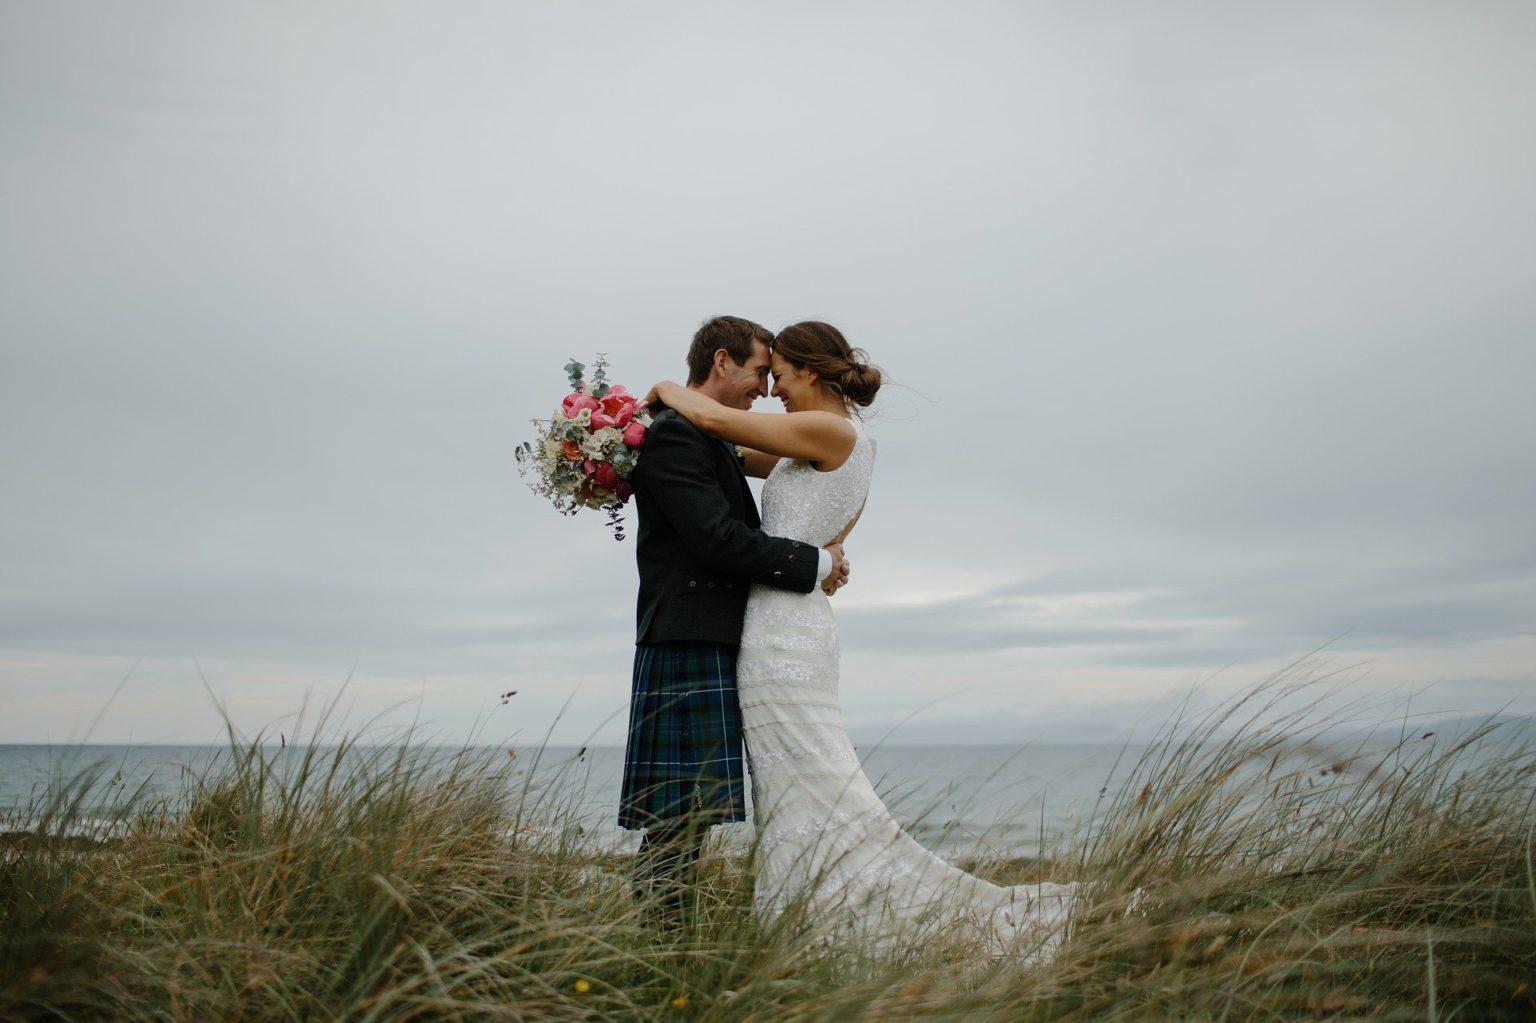 Larencontre Ladecouverte Mariage Photographie Emotion Weddingplanner